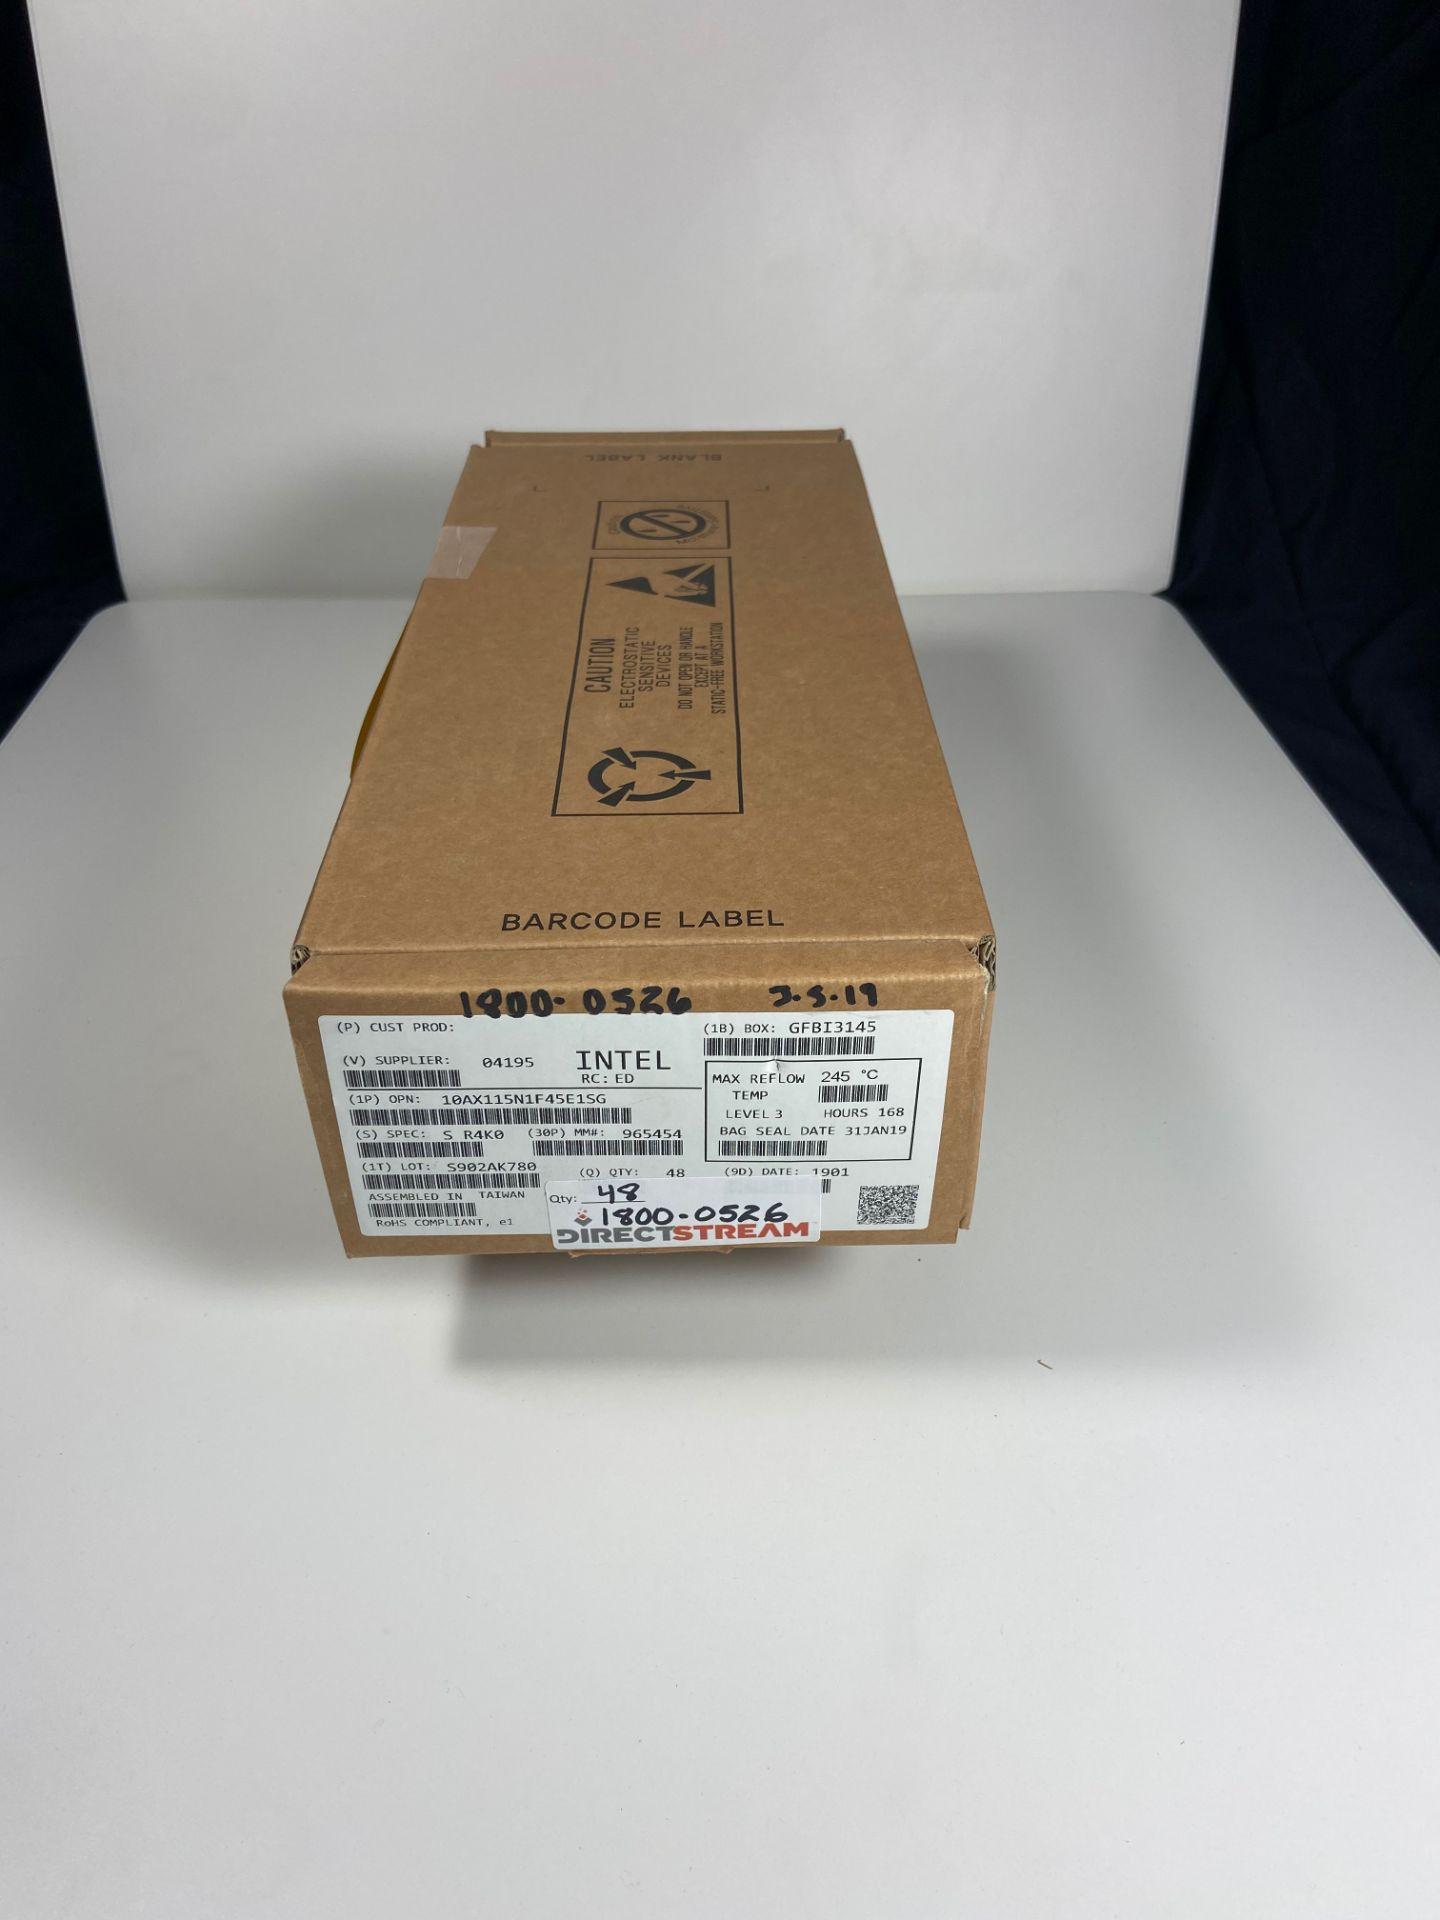 Intel 10AX115N1F45E1SG, QTY 48, FPGA Arria 10 GX Family 1150000 Cells 20nm Technology 0. - Image 2 of 4